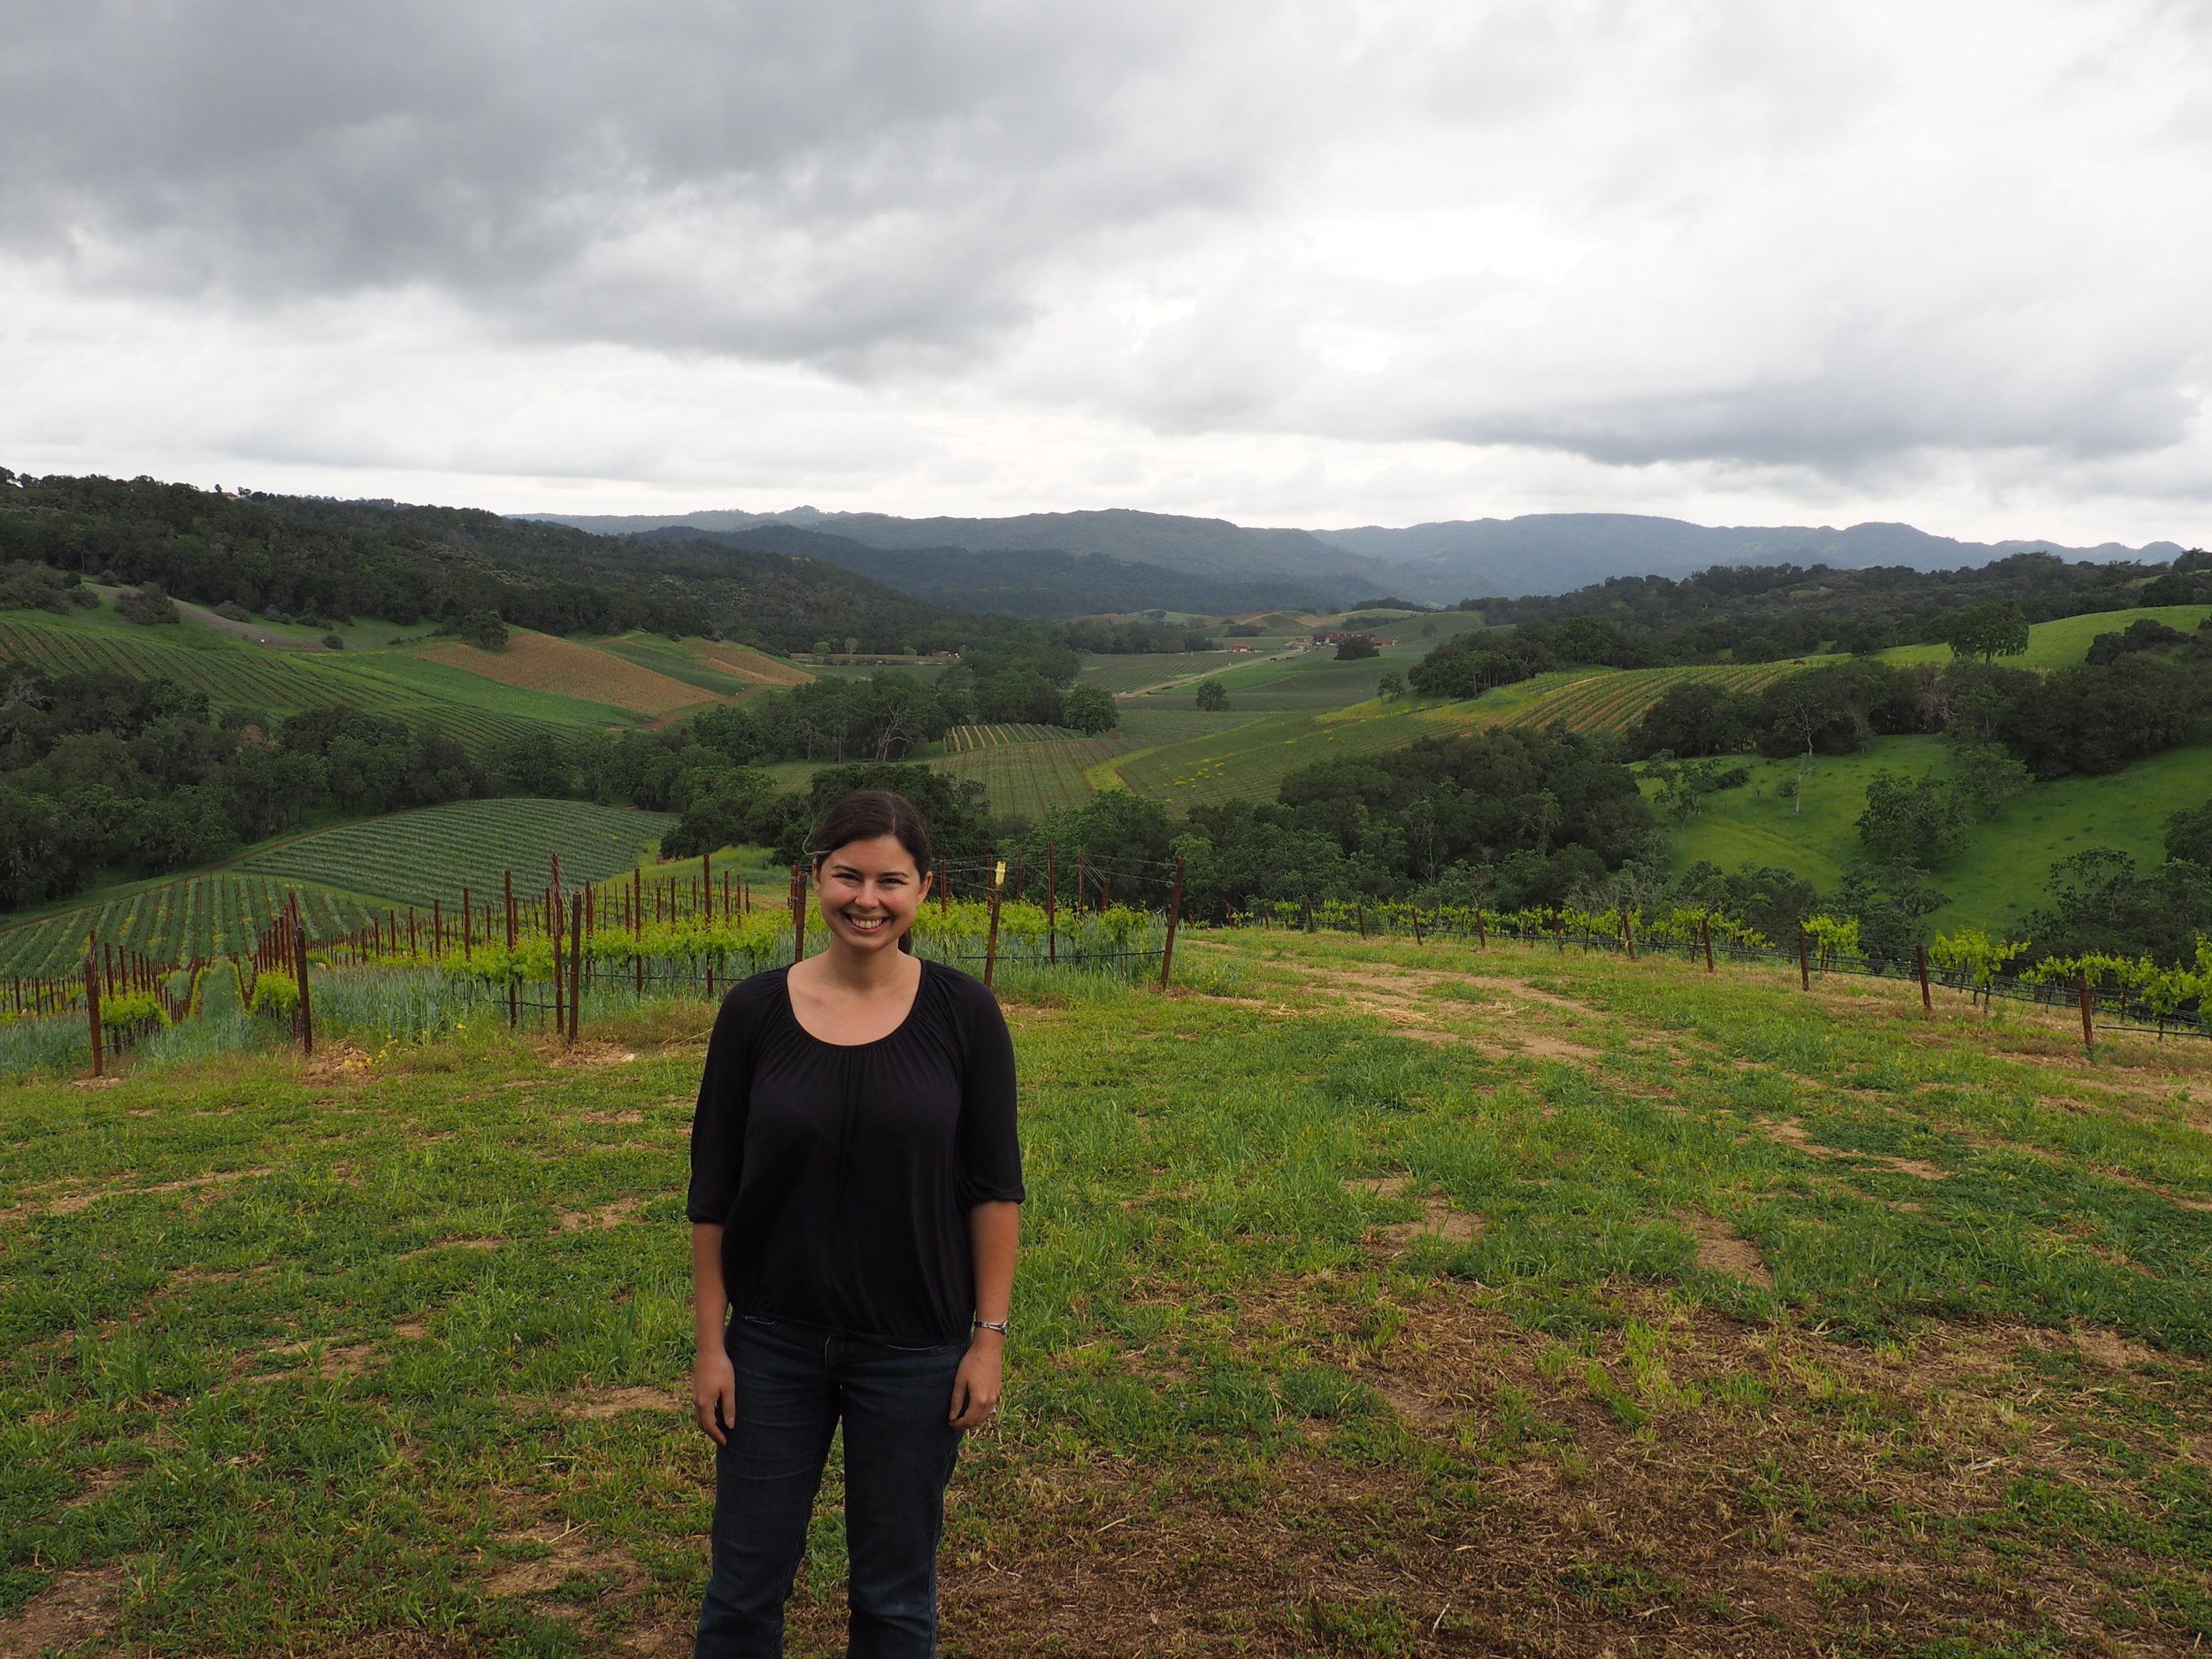 wine tasting in paso robles / lion's ridge at halter ranch vineyard excursion tour